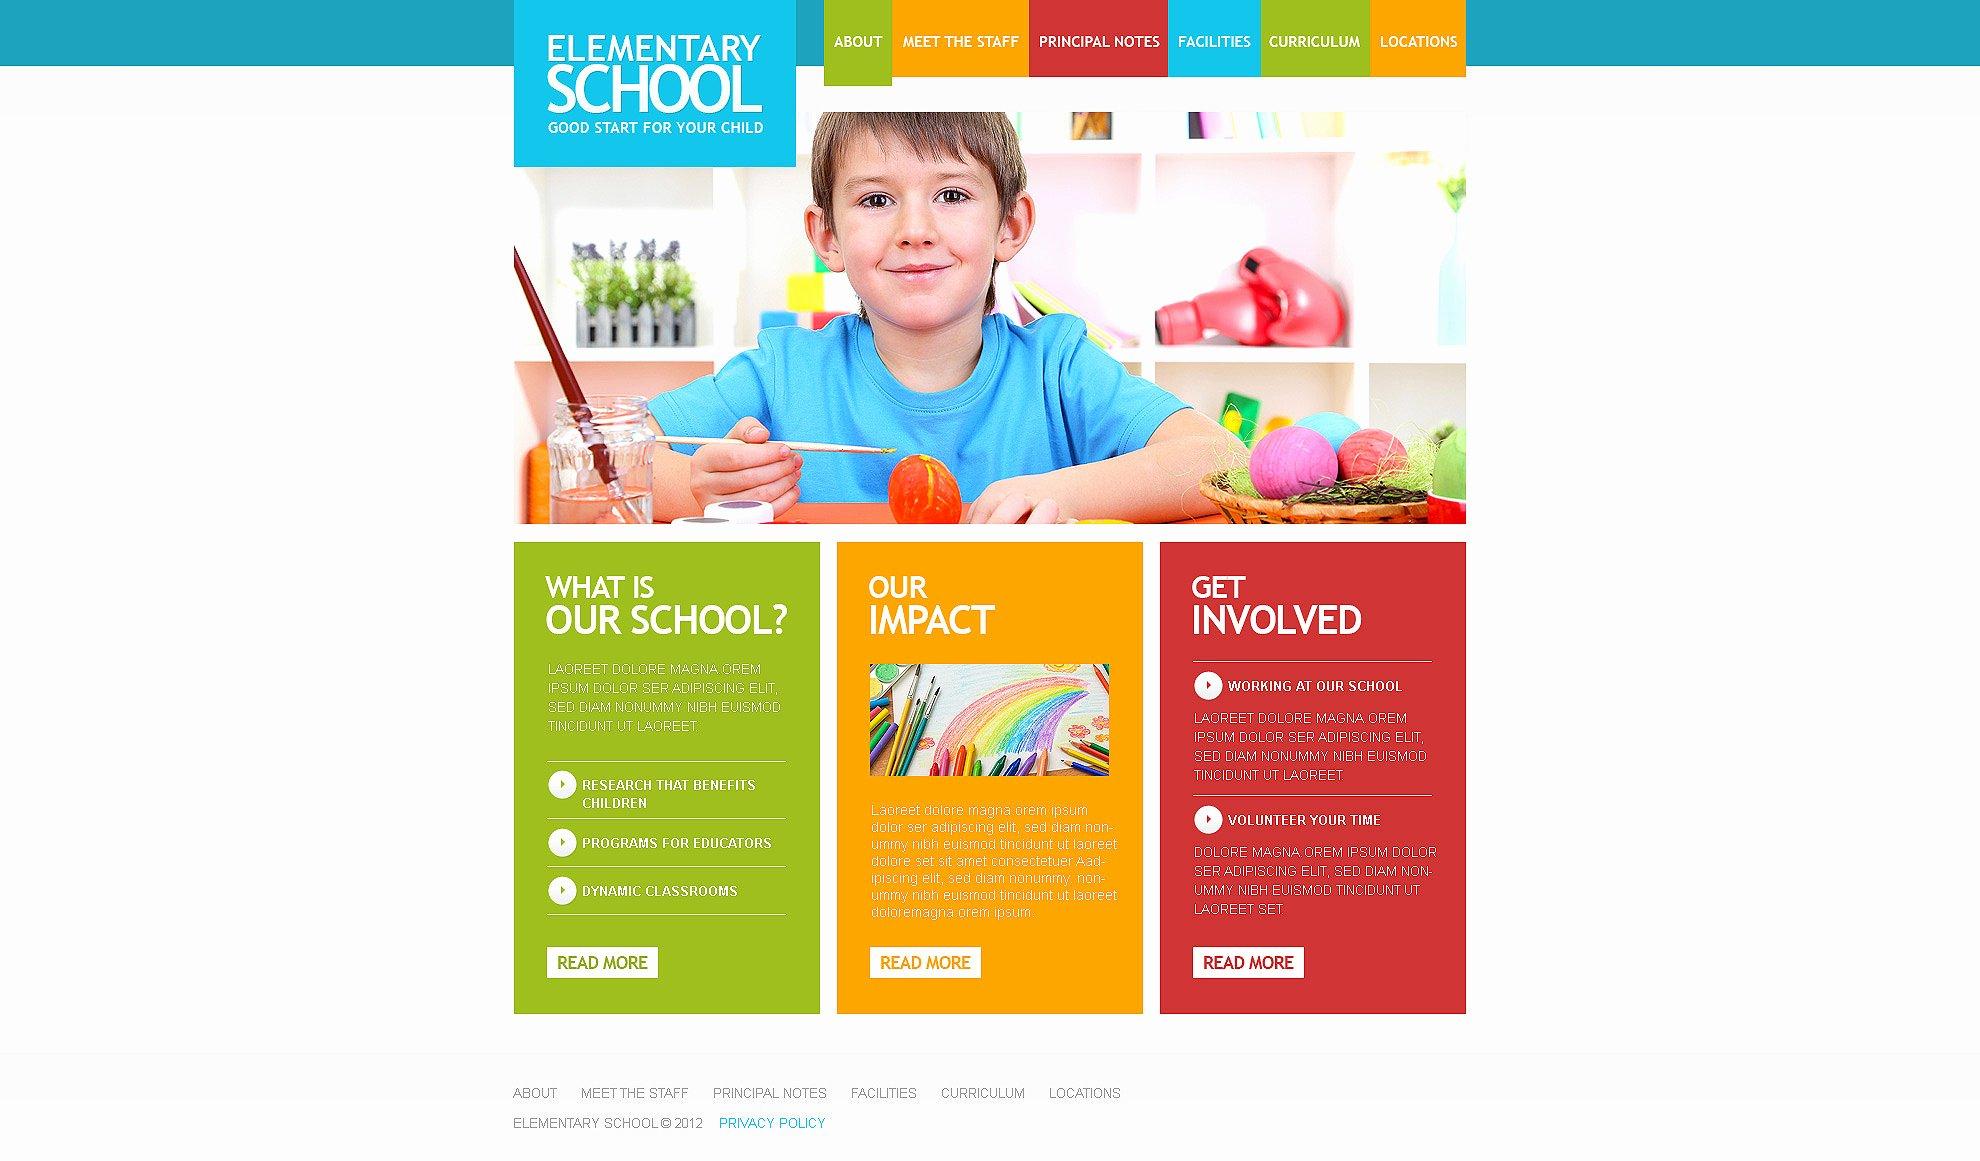 School Web Site Template Inspirational Primary School Responsive Website Template